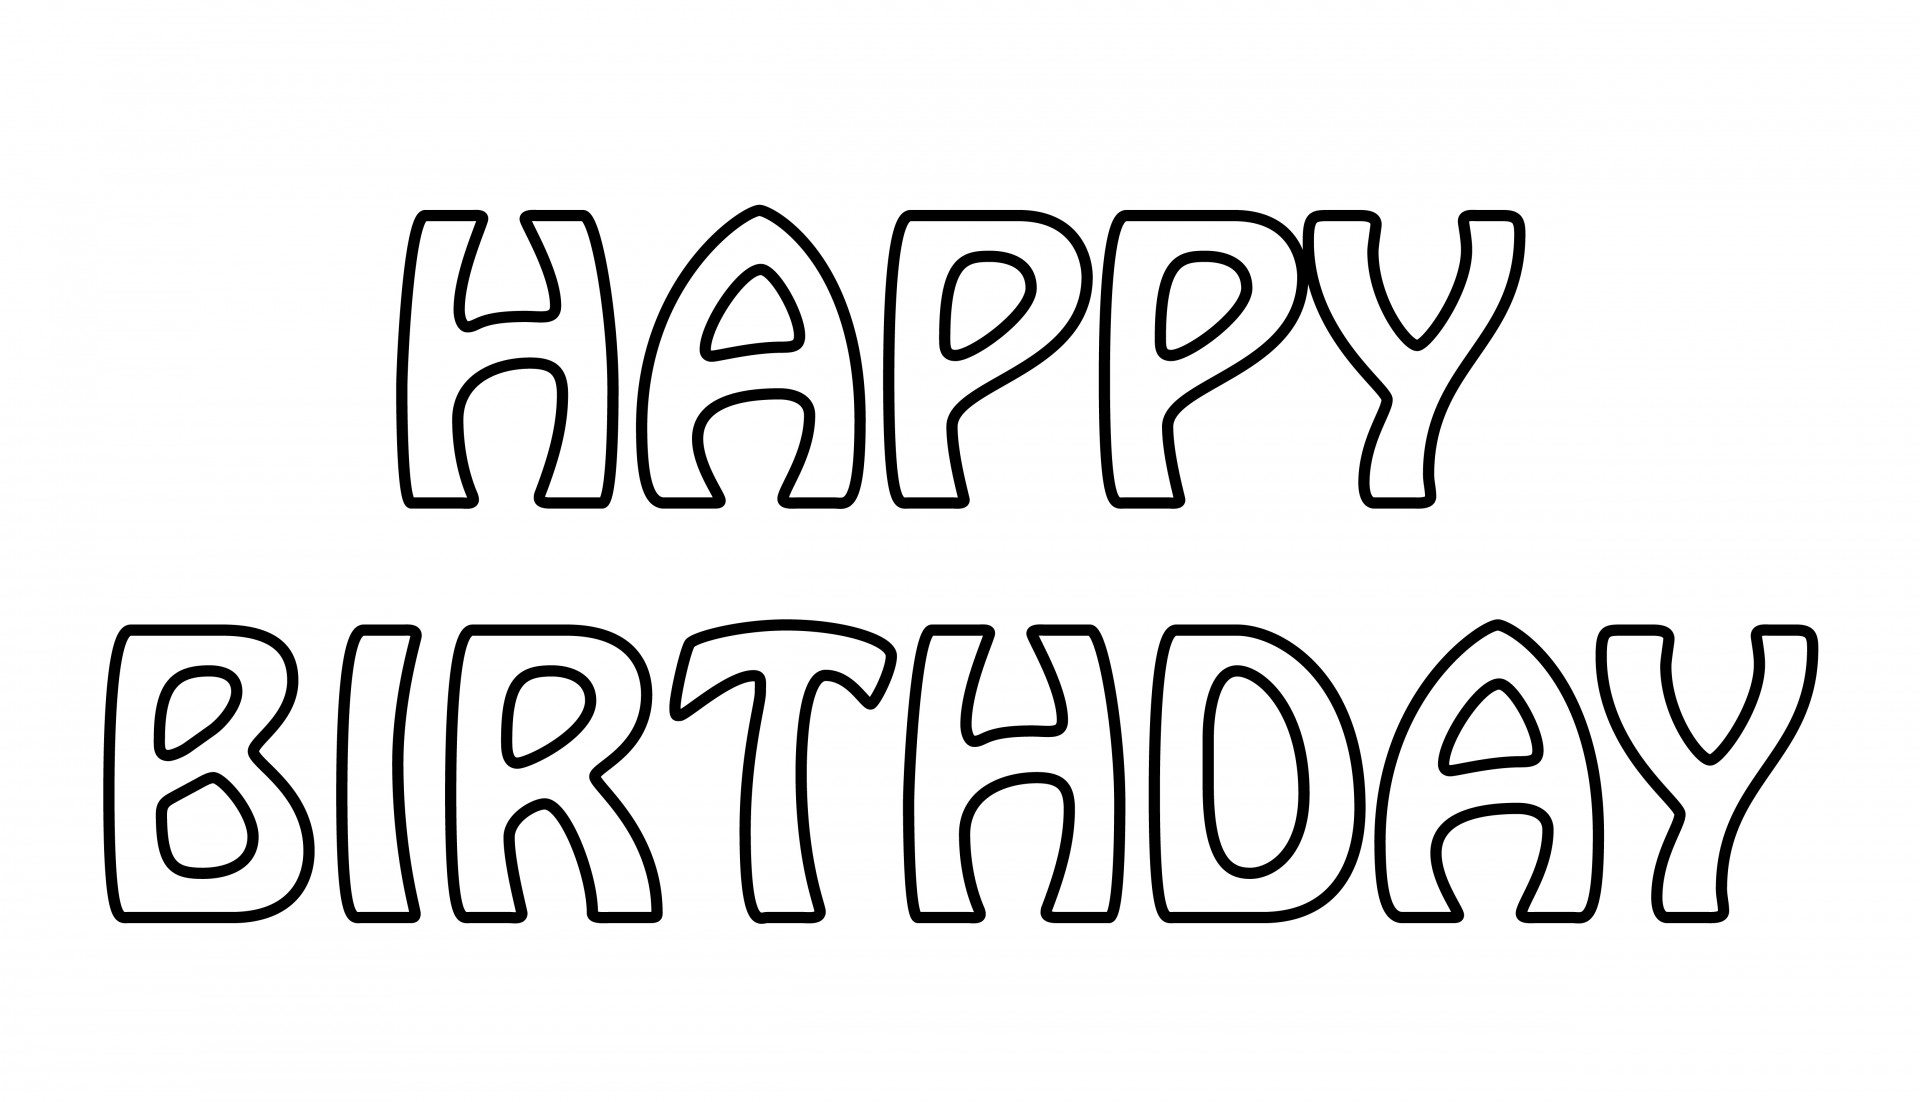 Happy Birthday Text Outline Free Stock Photo